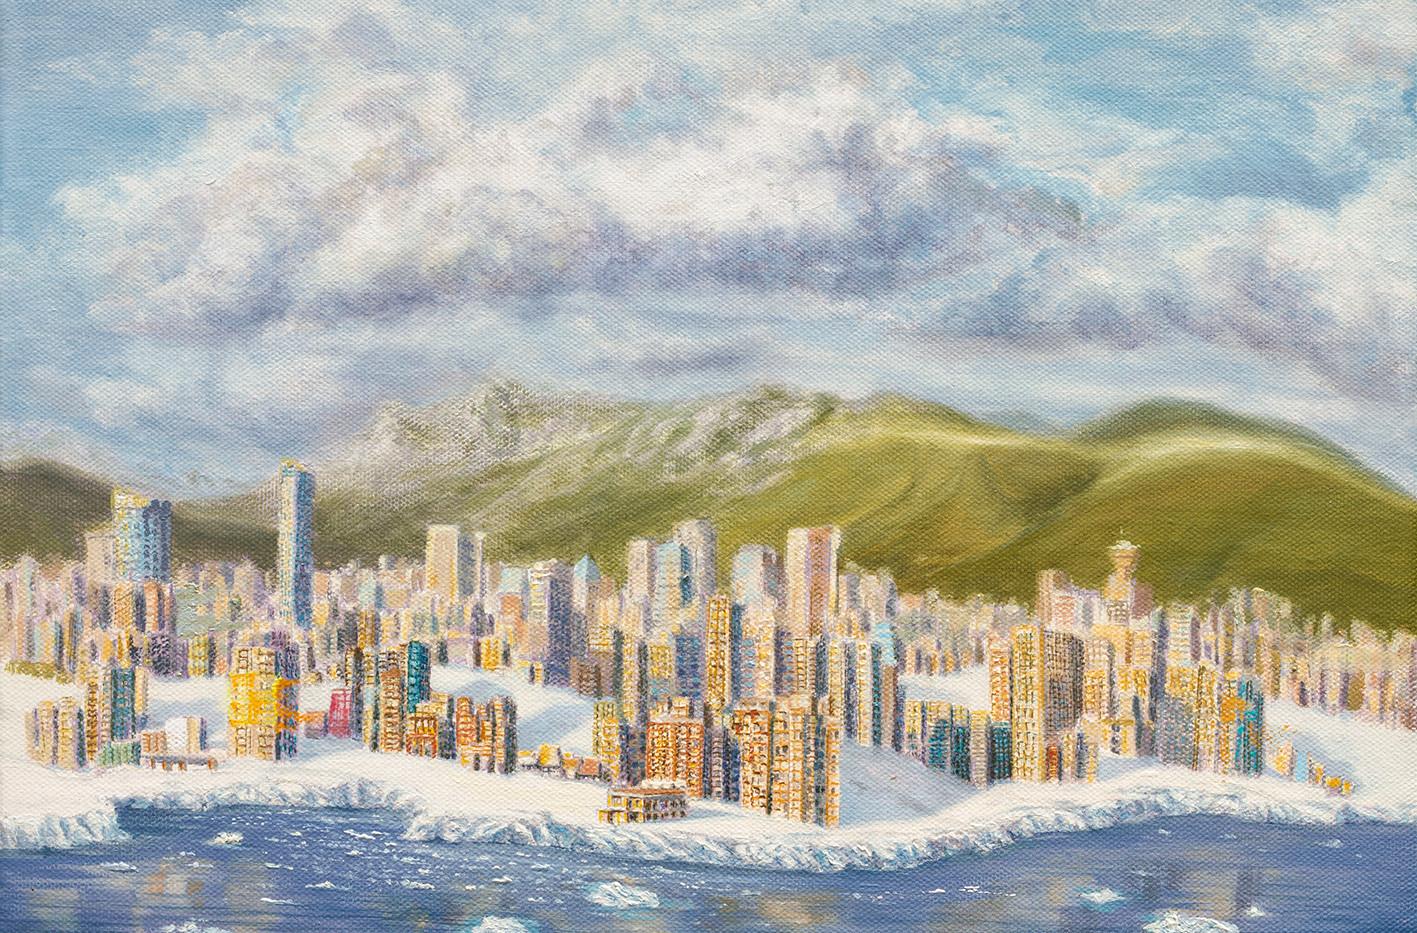 Glacier City V (Vancouver)